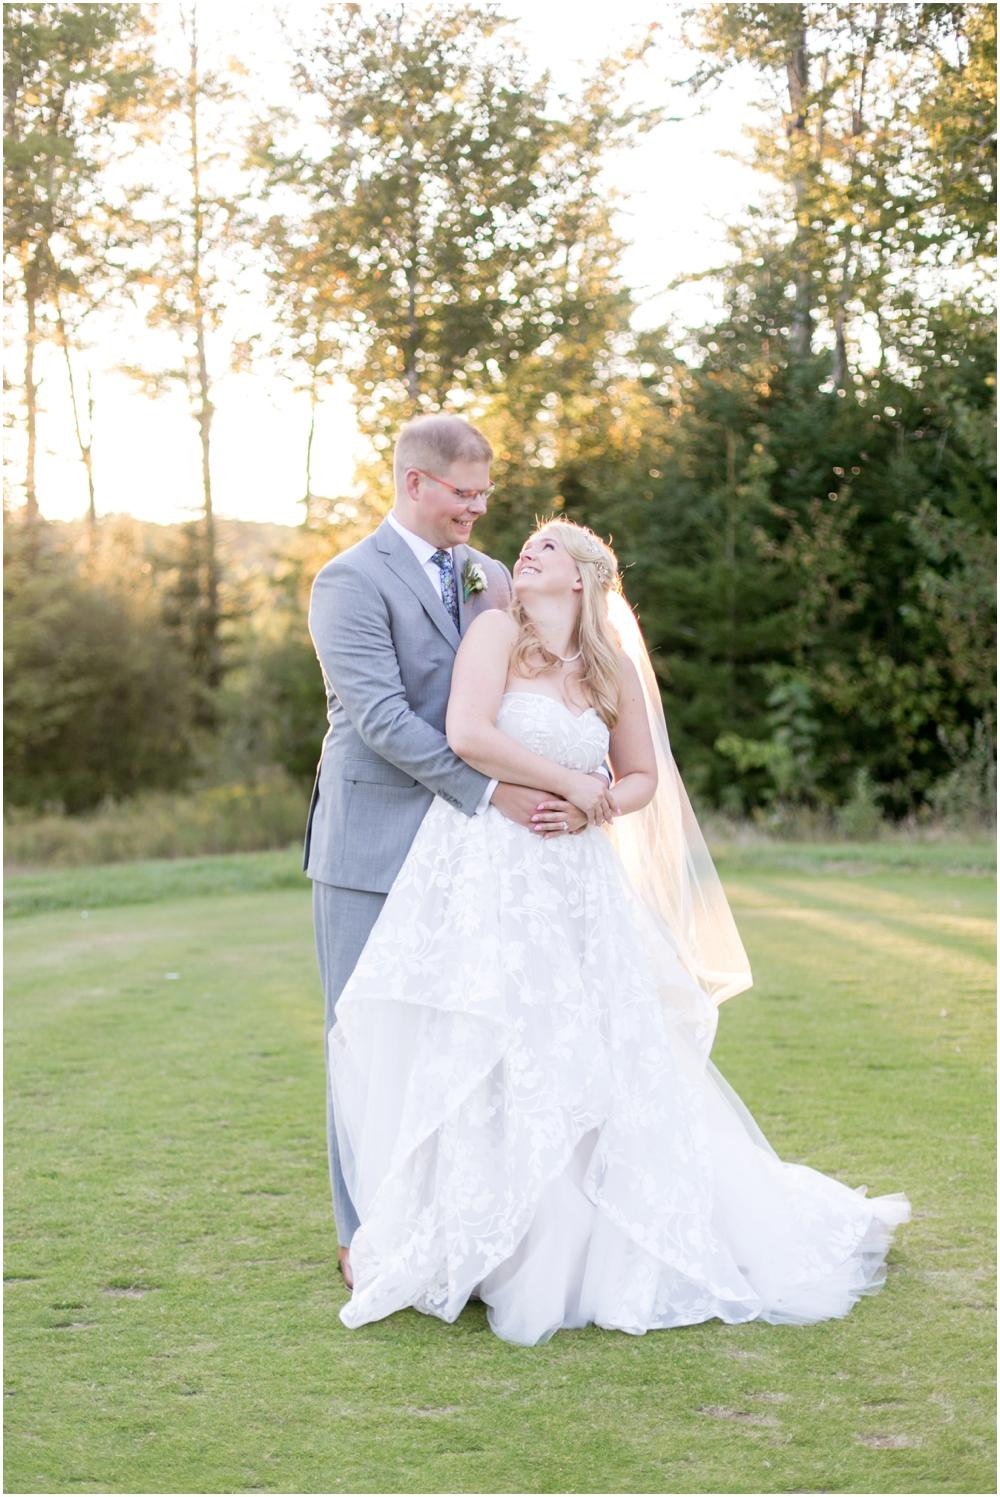 Glen-Arbour-Golf-Course-Wedding-Chantal-Ruthier-Photography_0027.jpg